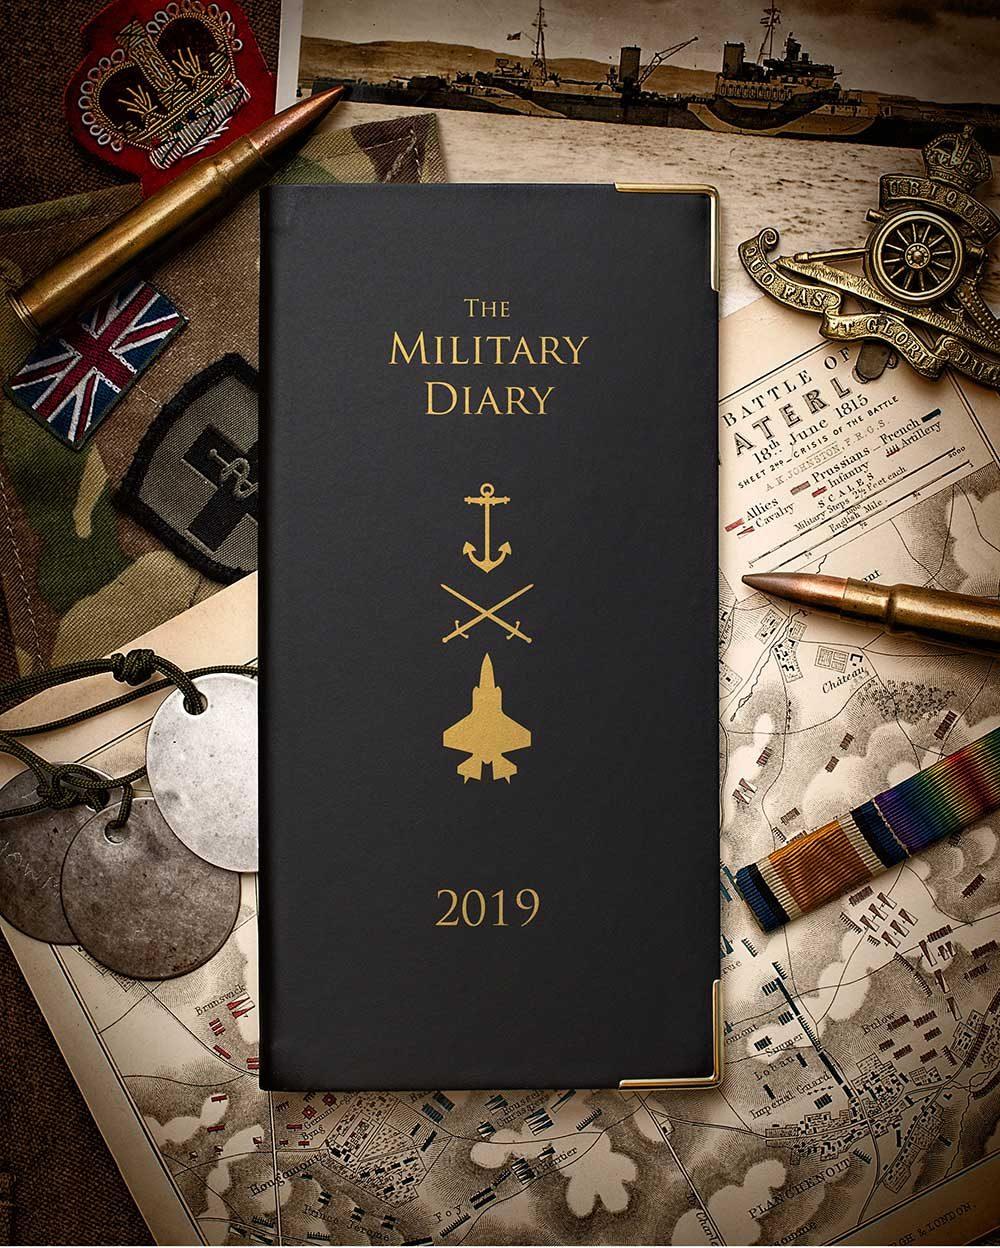 The Military Diary 2019